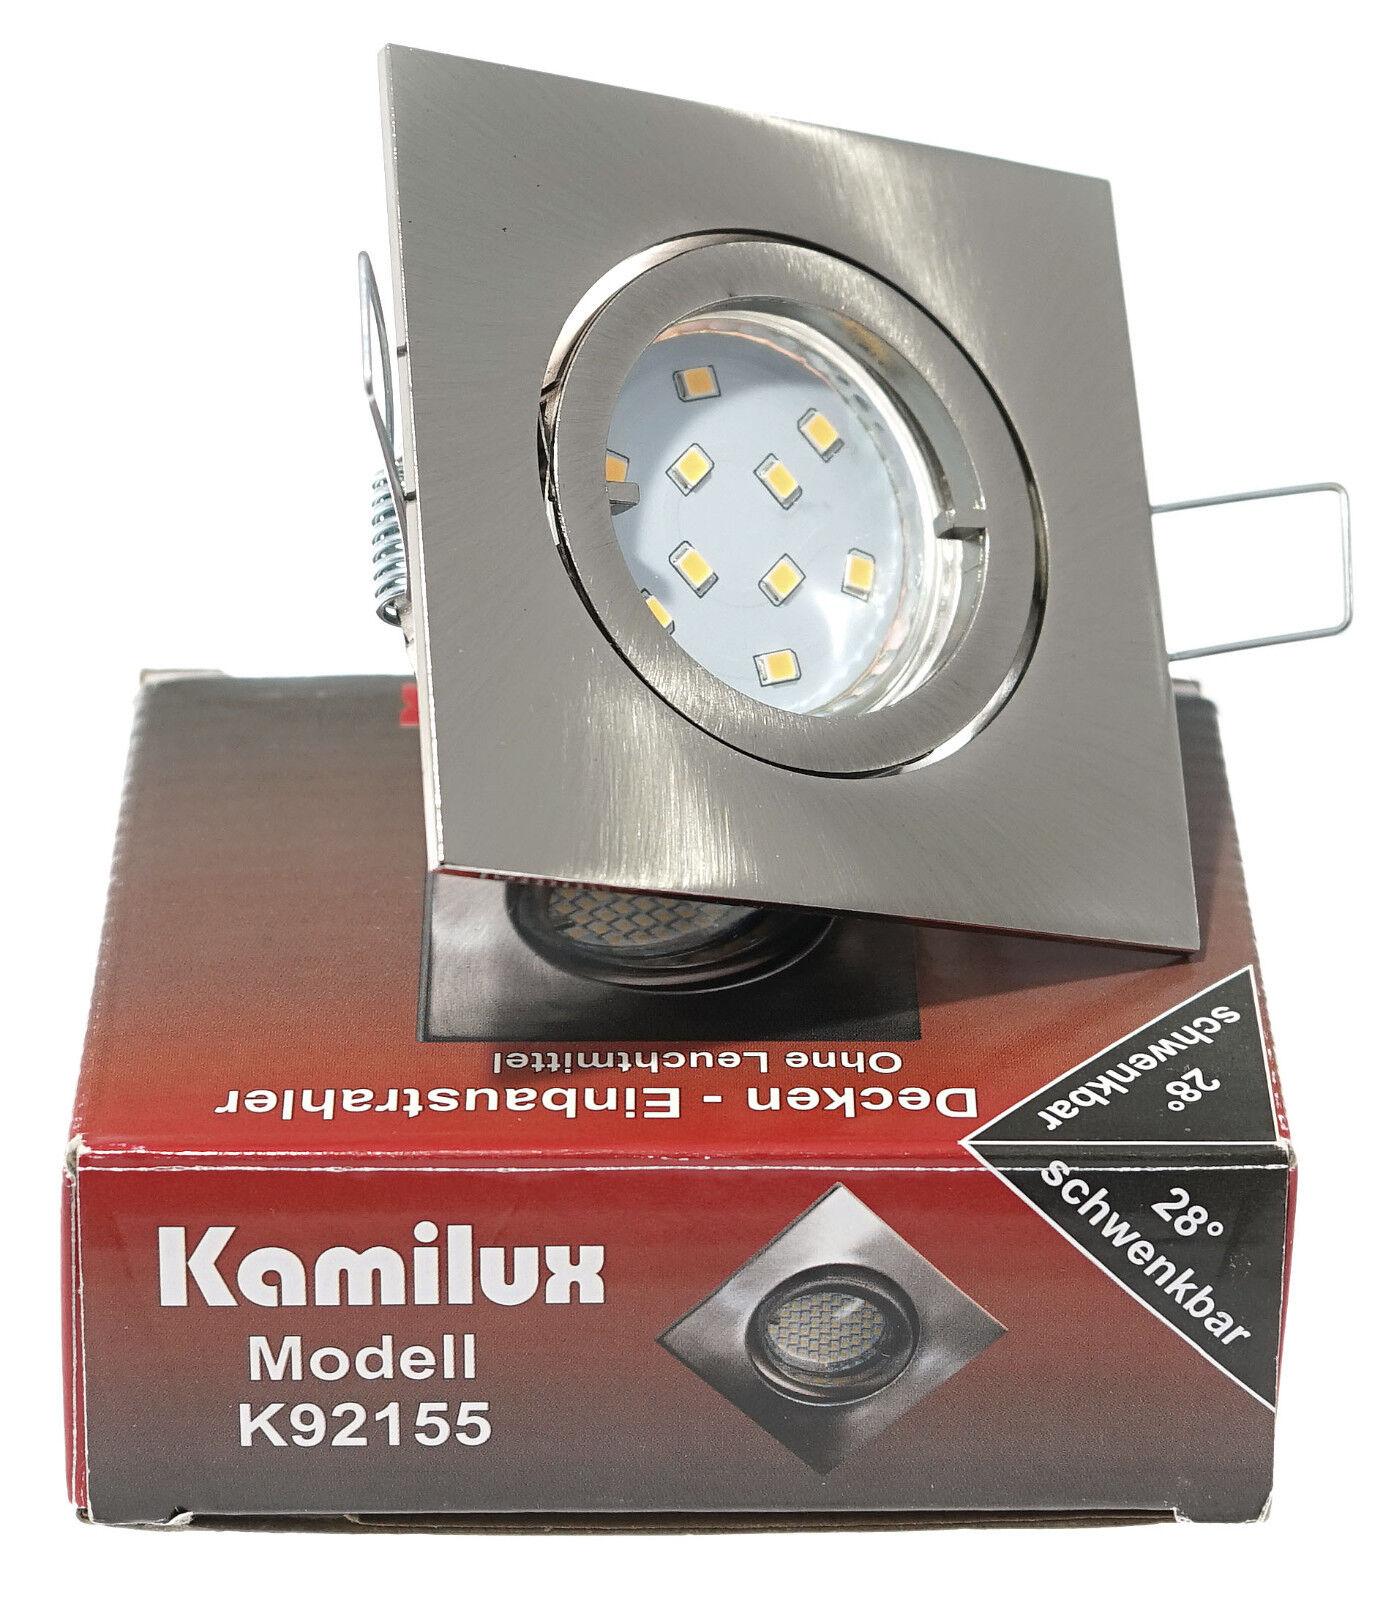 Einbaulampe Louis Edelstahl geb. GU10 10er SMD Power LED LED LED 3W = 25W 230V 950400